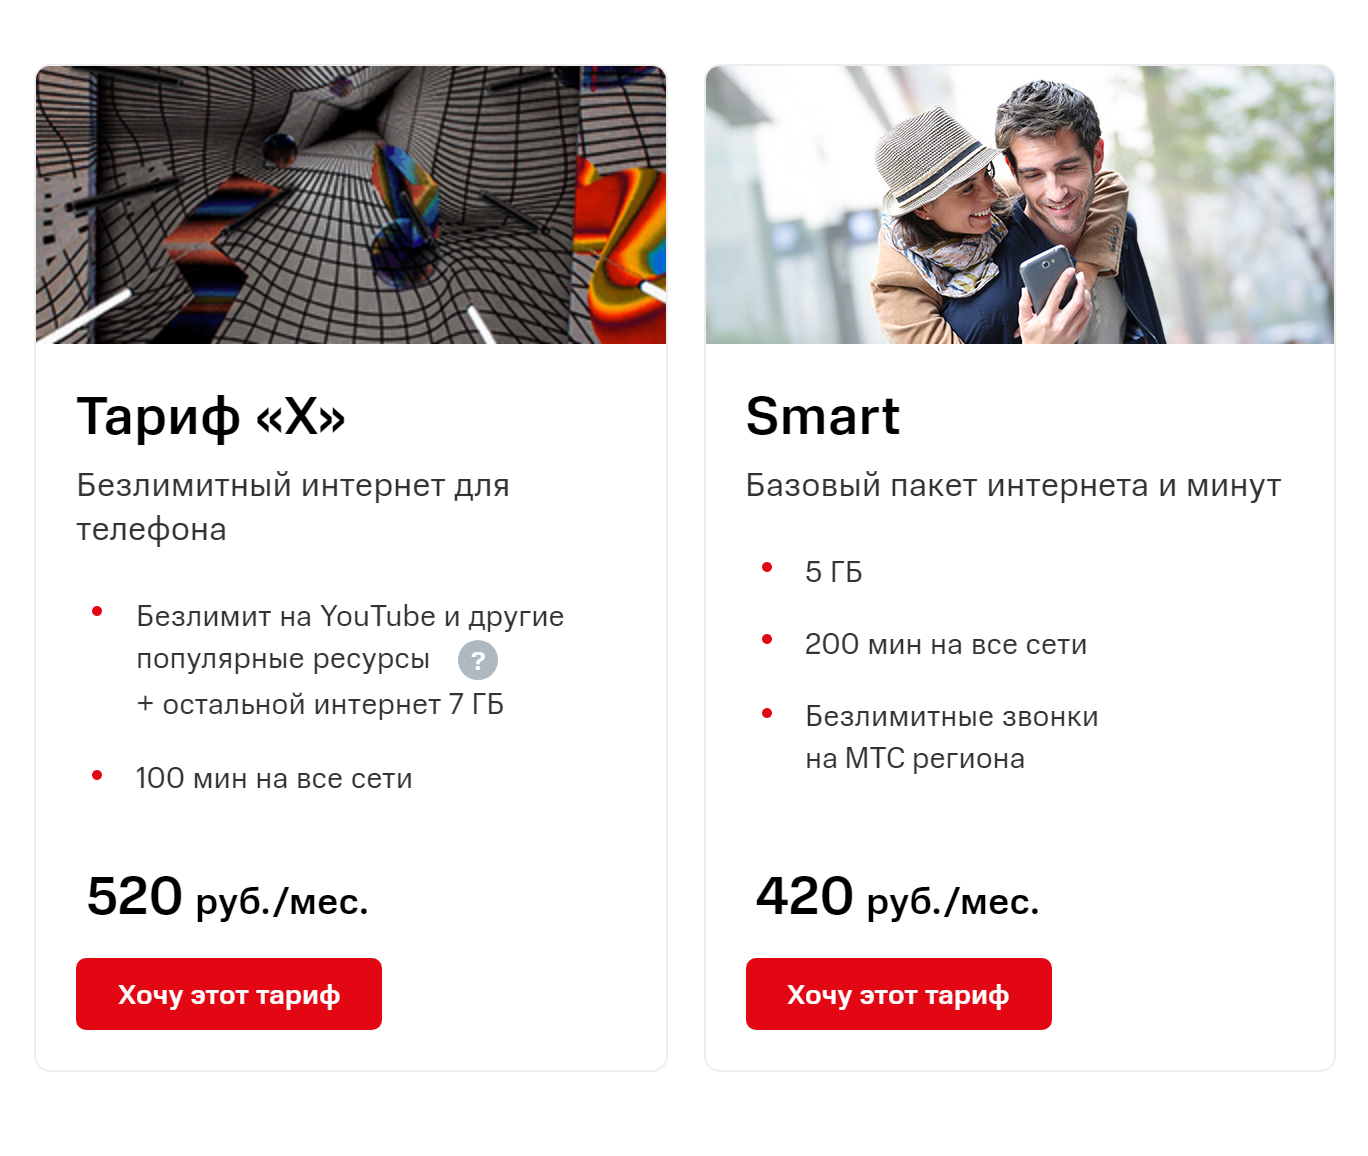 Такой же тариф для&nbsp;москвичей стоит на&nbsp;30&nbsp;<span class=ruble>Р</span> дешевле, а интернета дадут в&nbsp;2,5&nbsp;раза больше